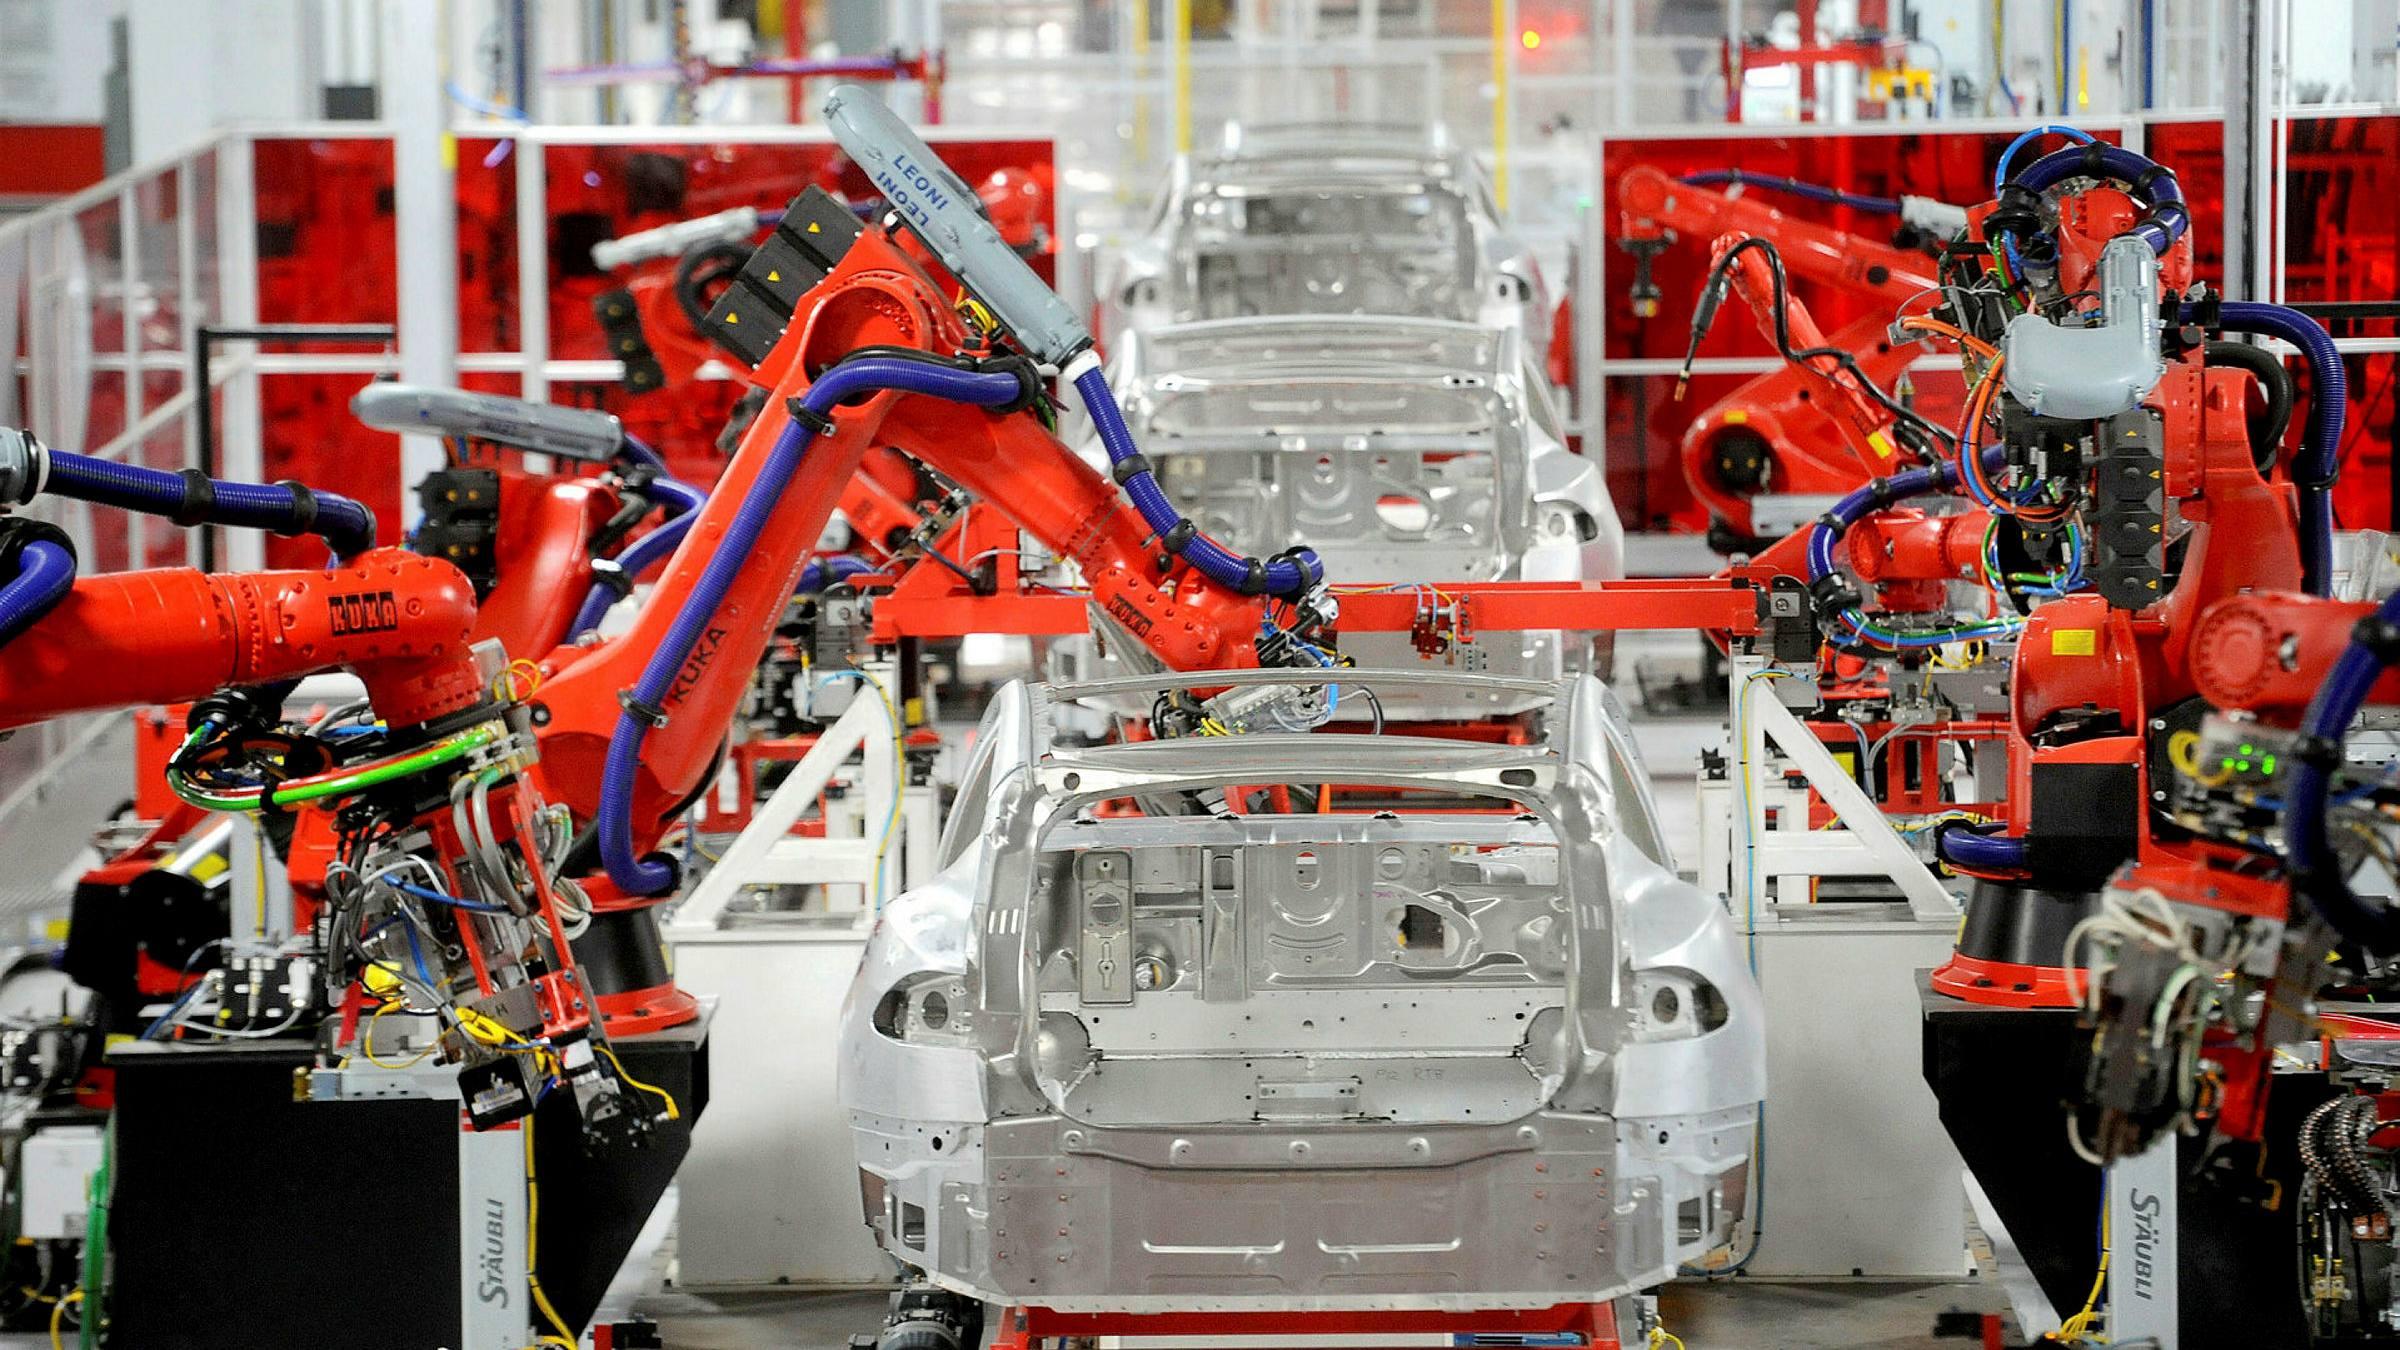 Here's what's really going on in Tesla's factory | FT Alphaville